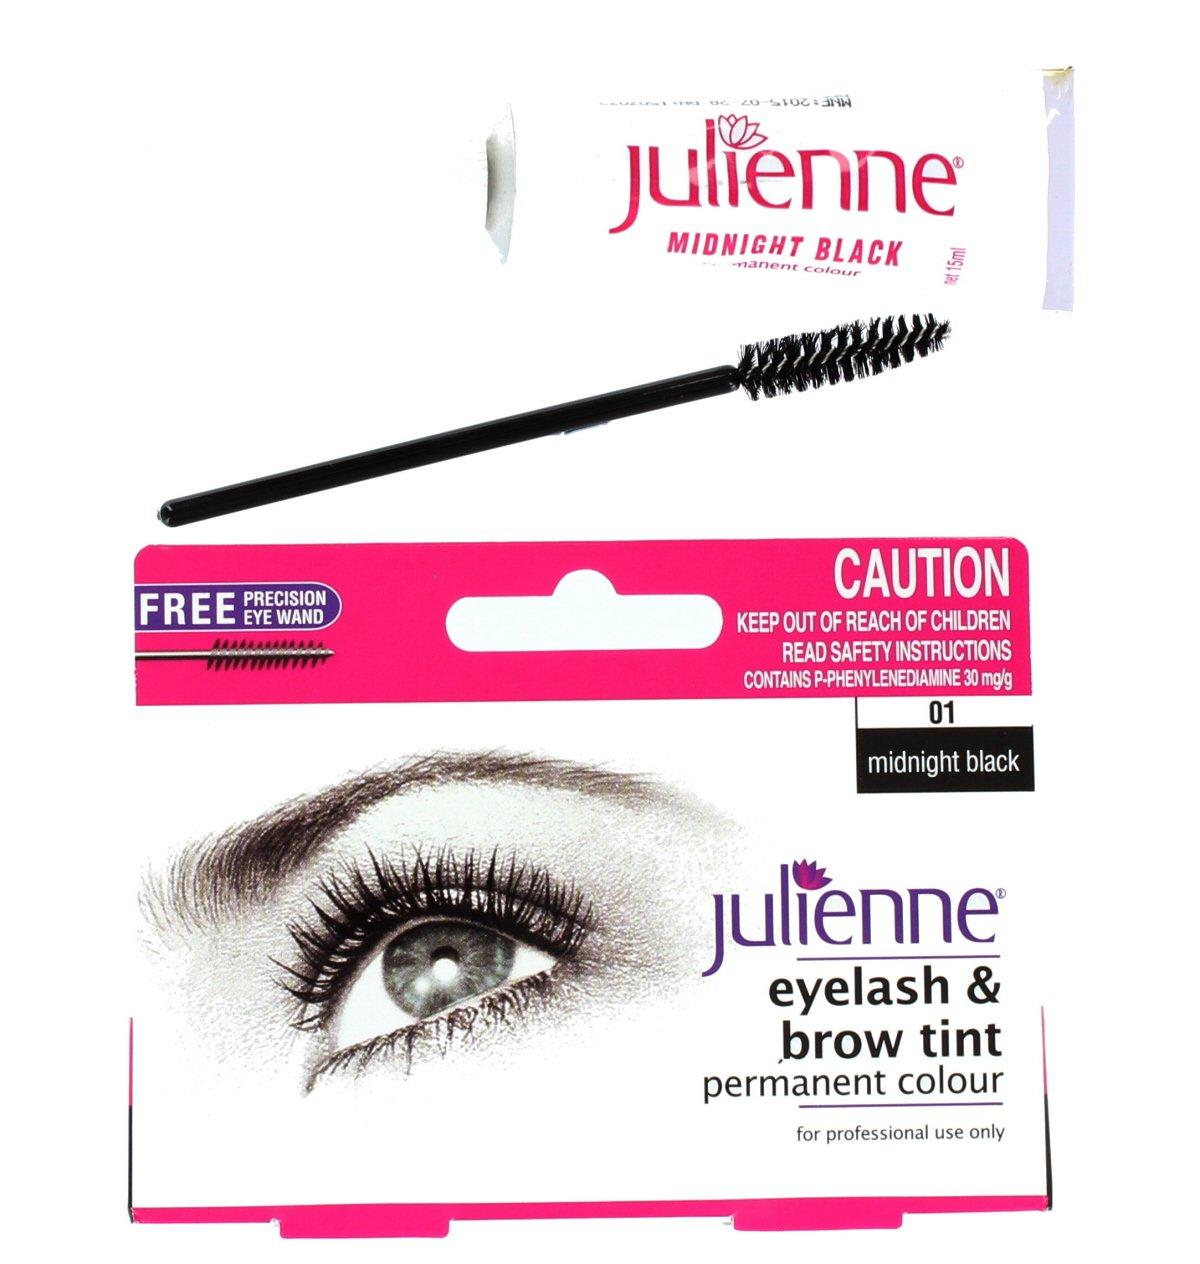 Julienne Eyelash Eyebrow Tinting Kit Dye Midnight Black Brush Tint